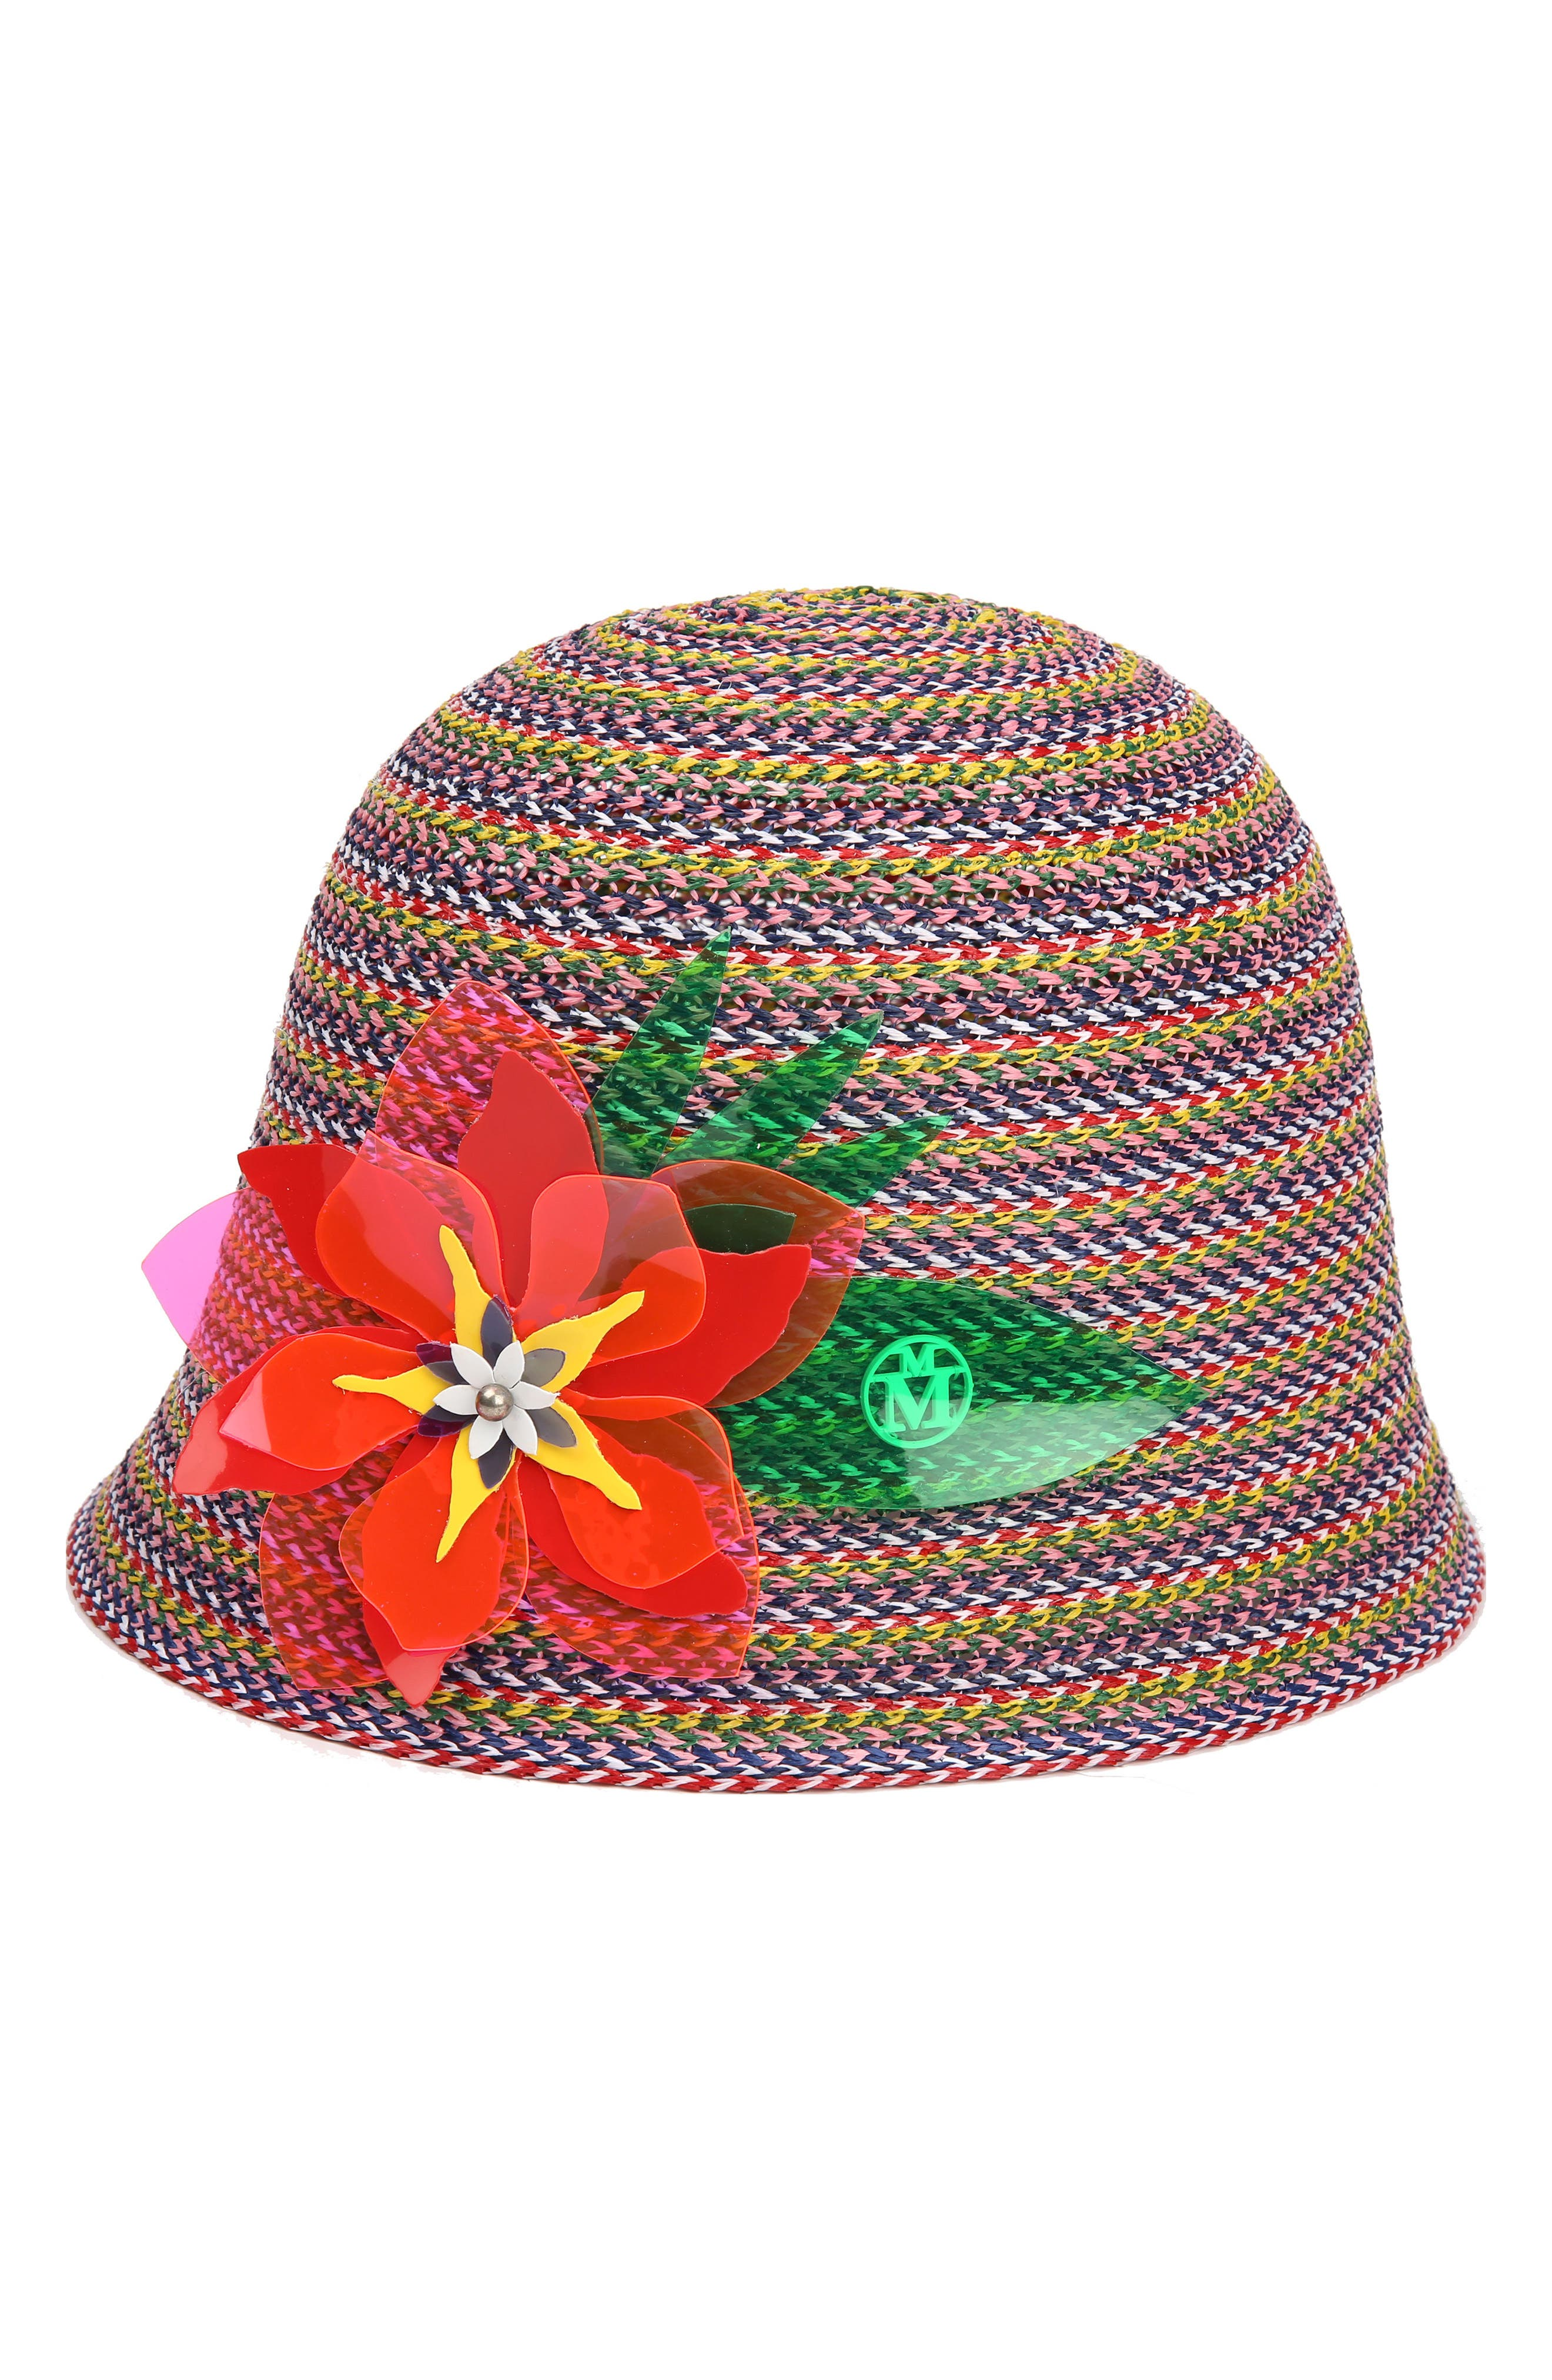 Jin Multicolor Straw Hat,                             Main thumbnail 1, color,                             600